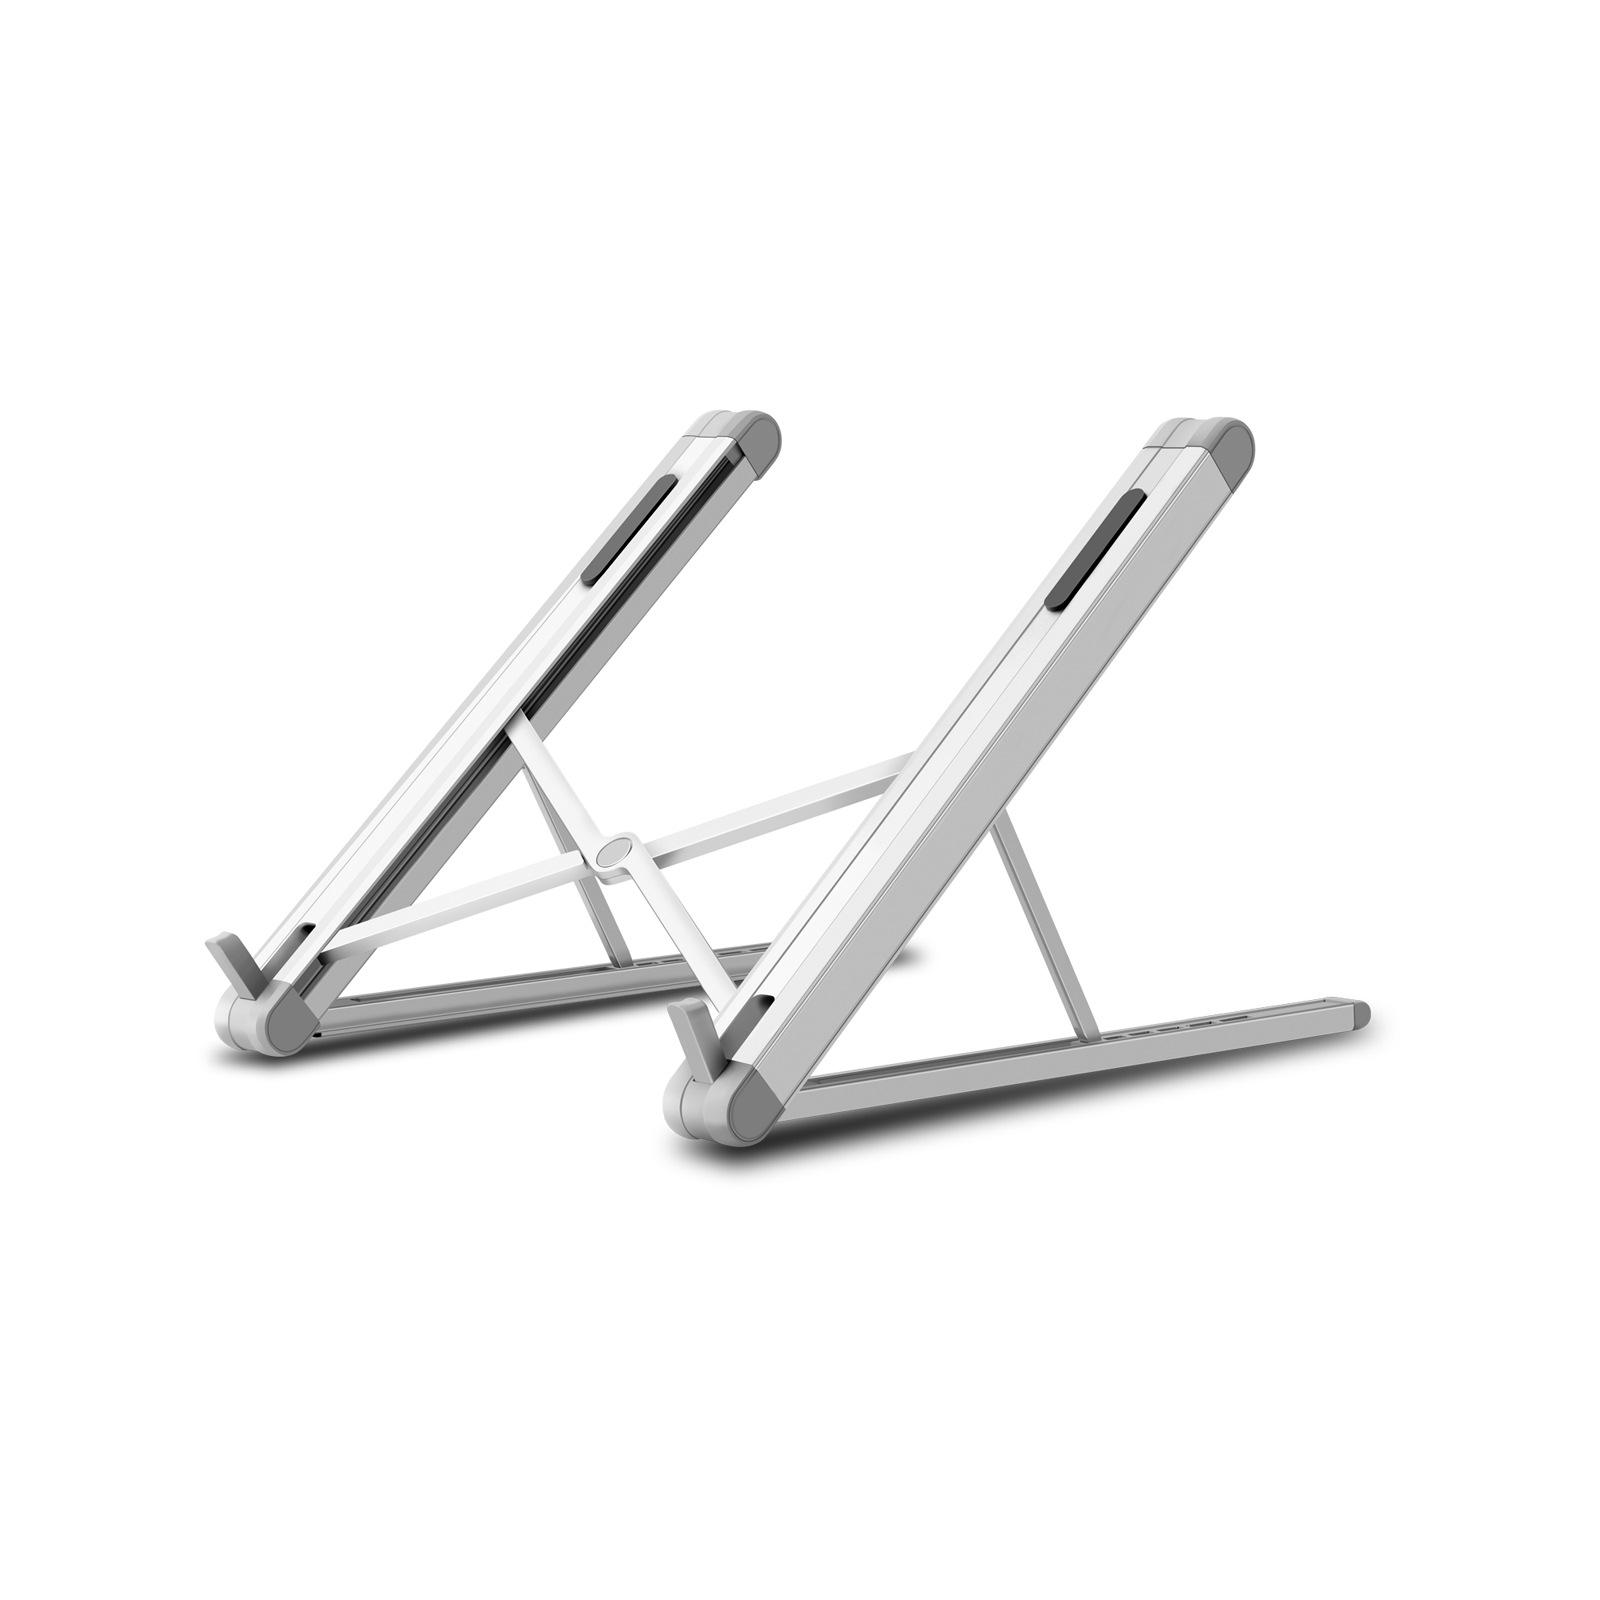 Aluminum Alloy Laptop Stand Adjustable Folding Portable Holder for Notebook Computer Bracket Lifting Cooling Holder  Silver grey